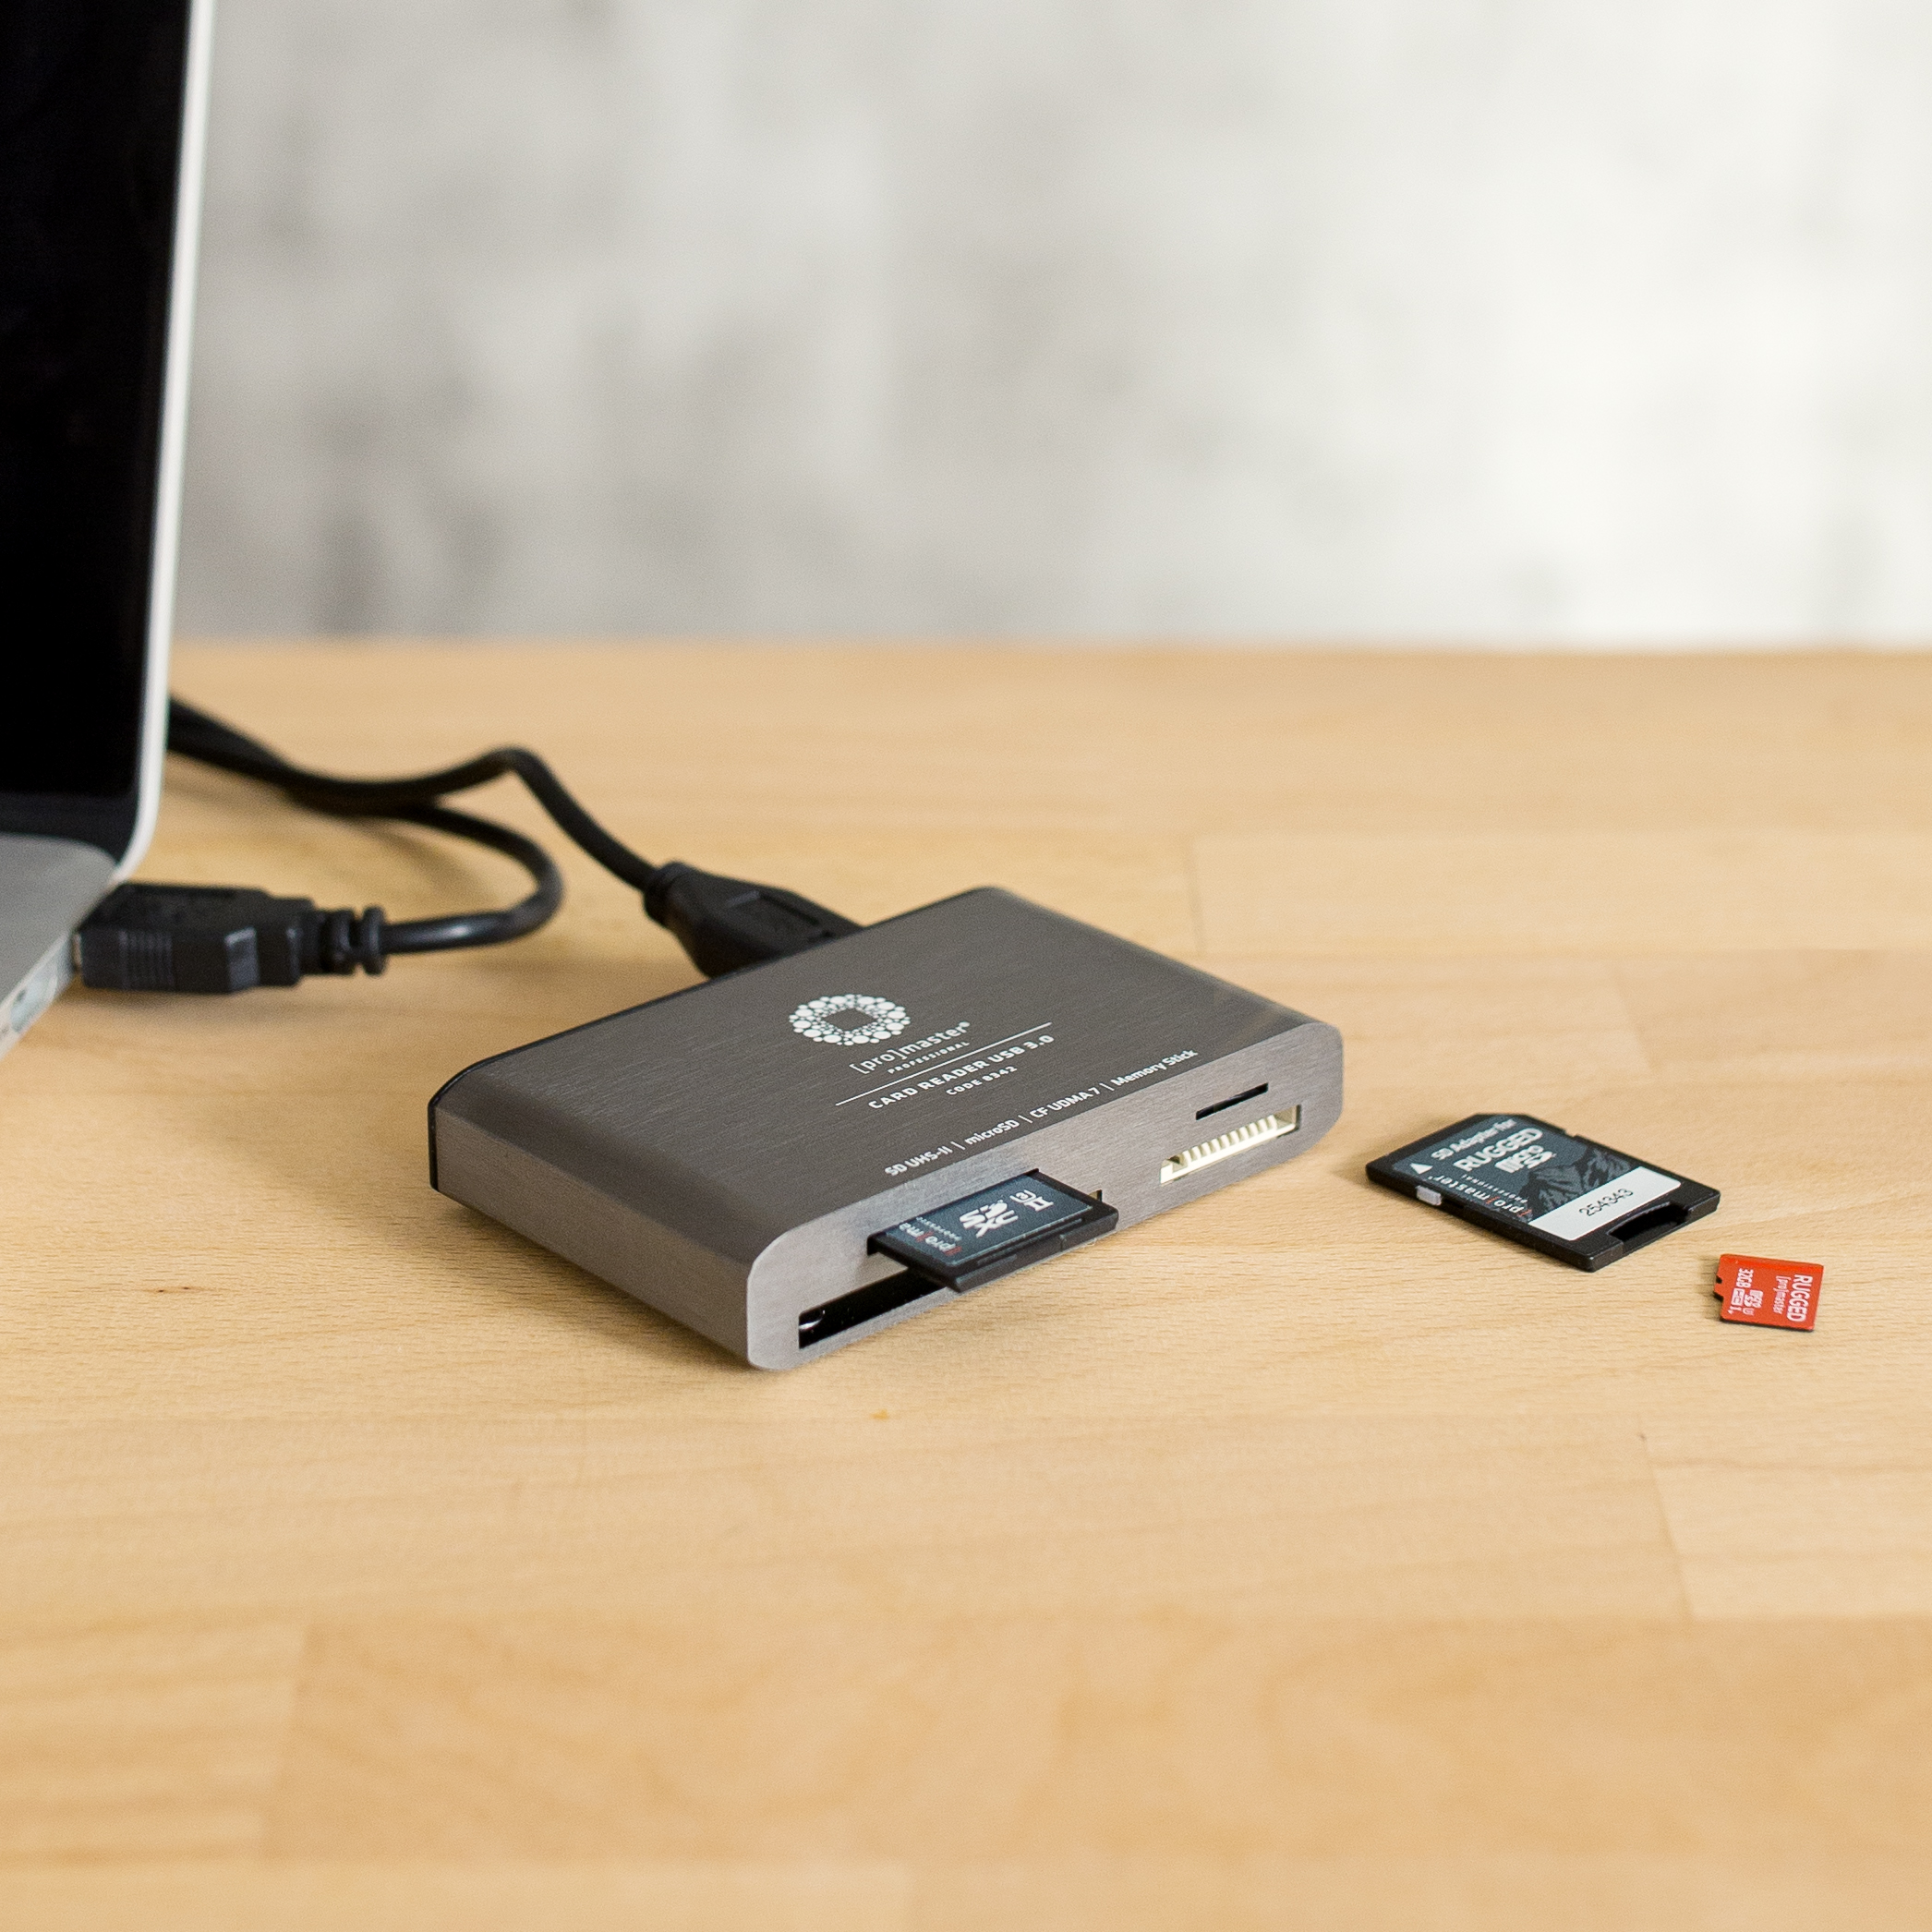 Professional USB 3.0 Multi Card Reader